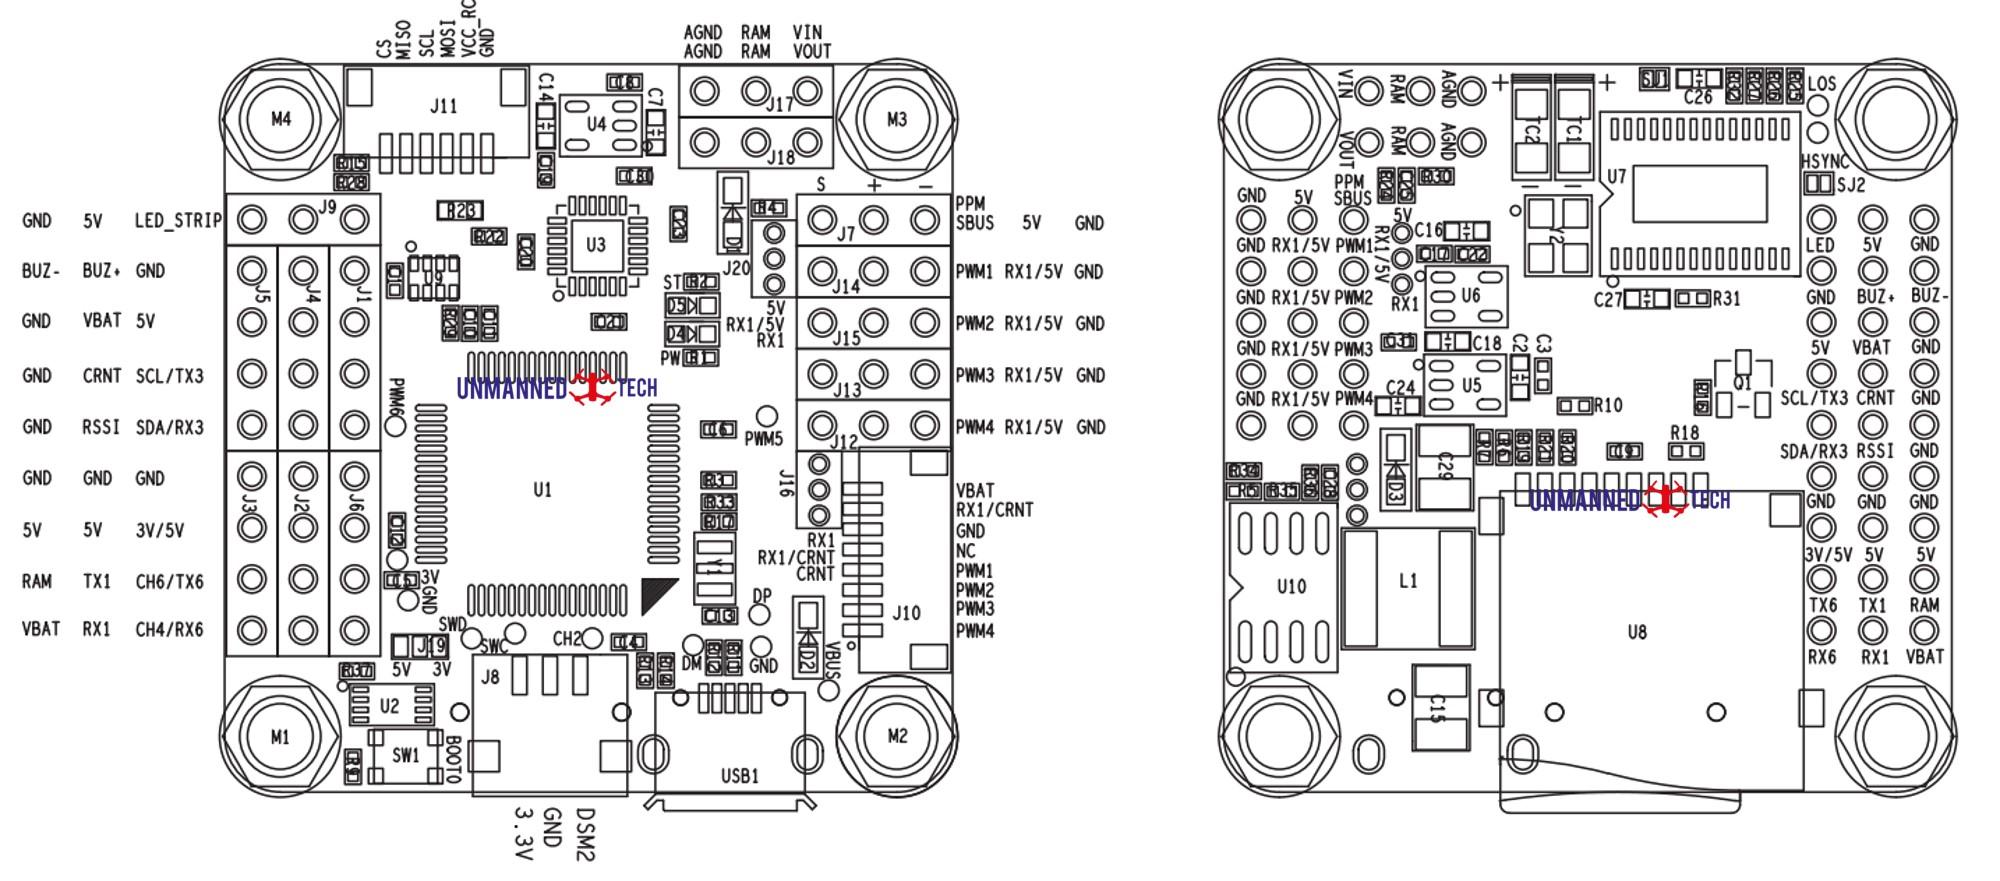 Omnibus F4 V5 Amp V6 Setup